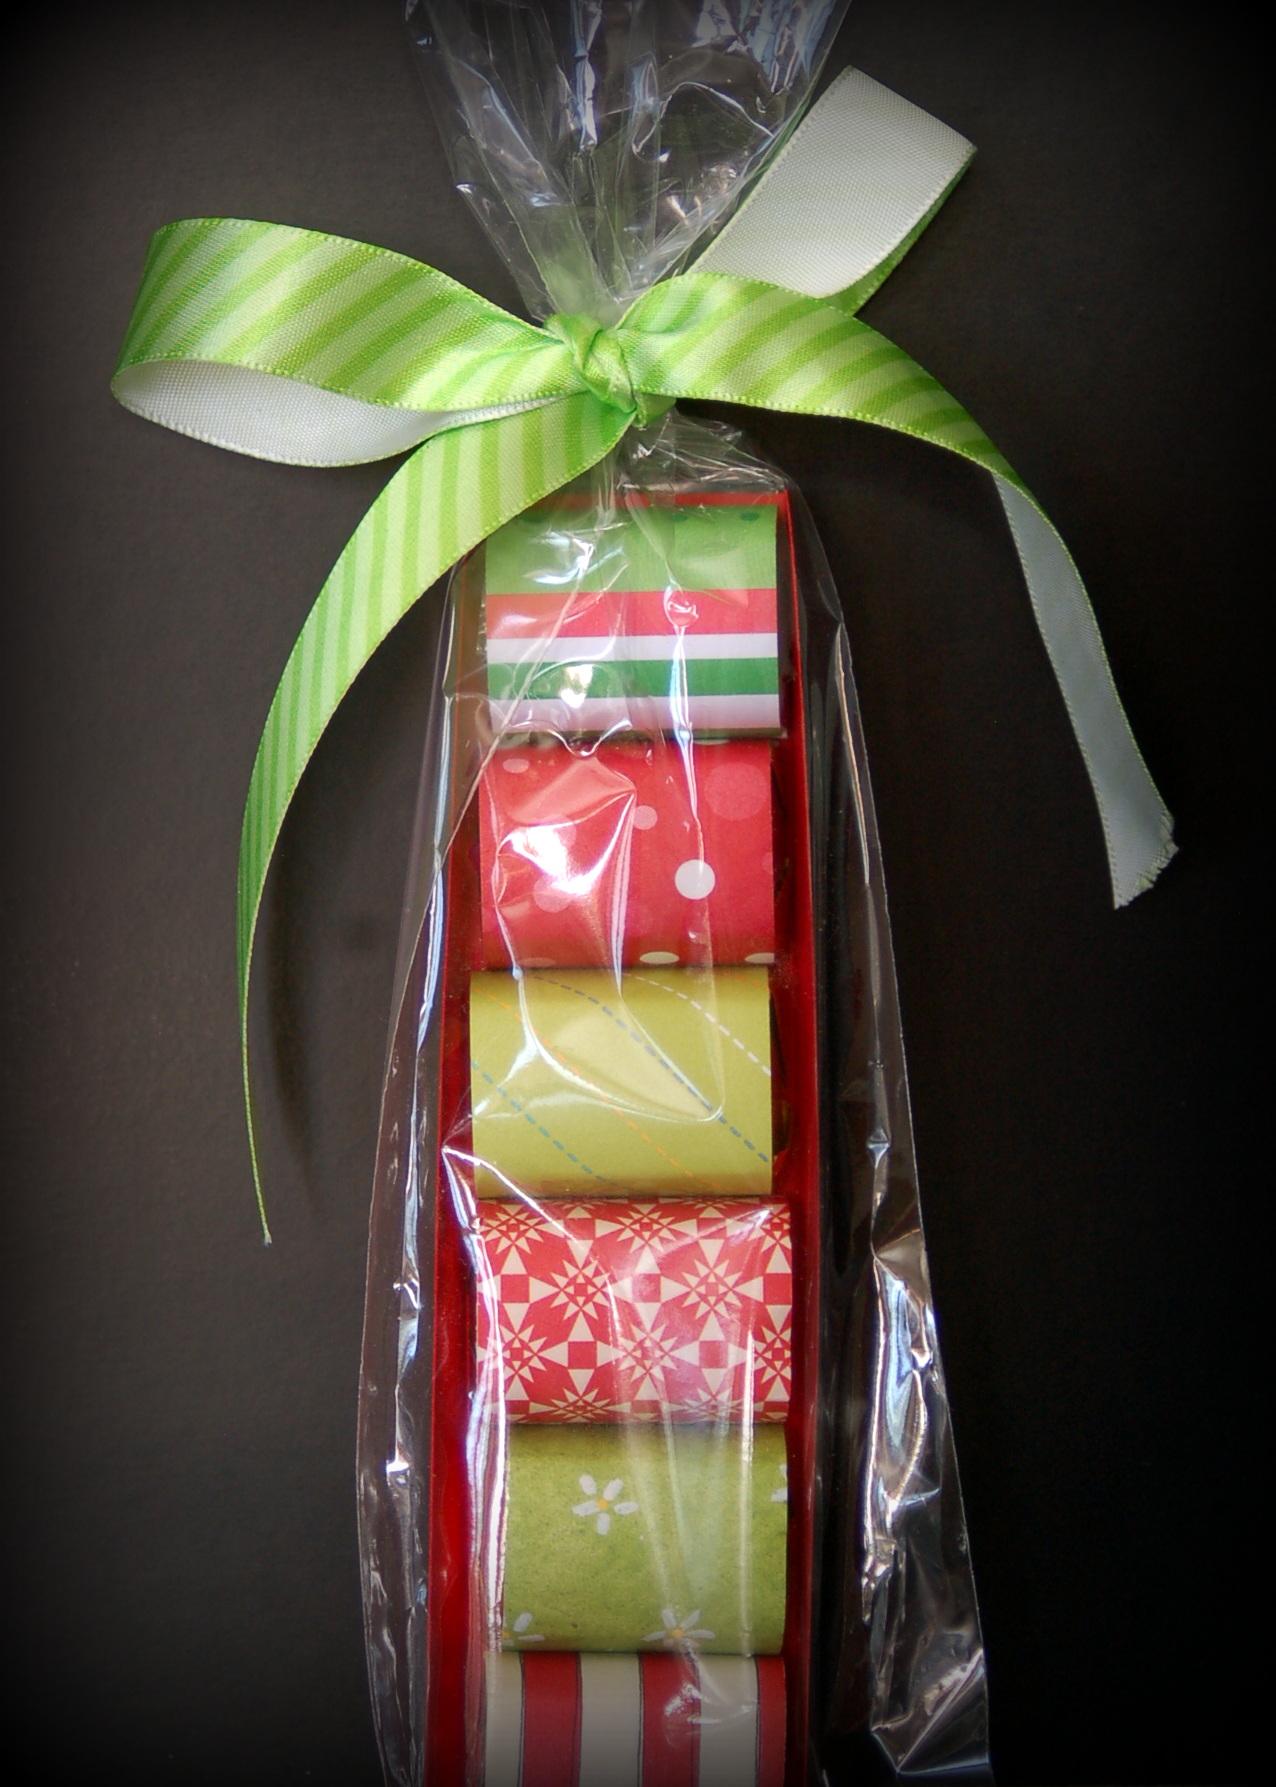 a cute little thank you gift pink polka dot creations